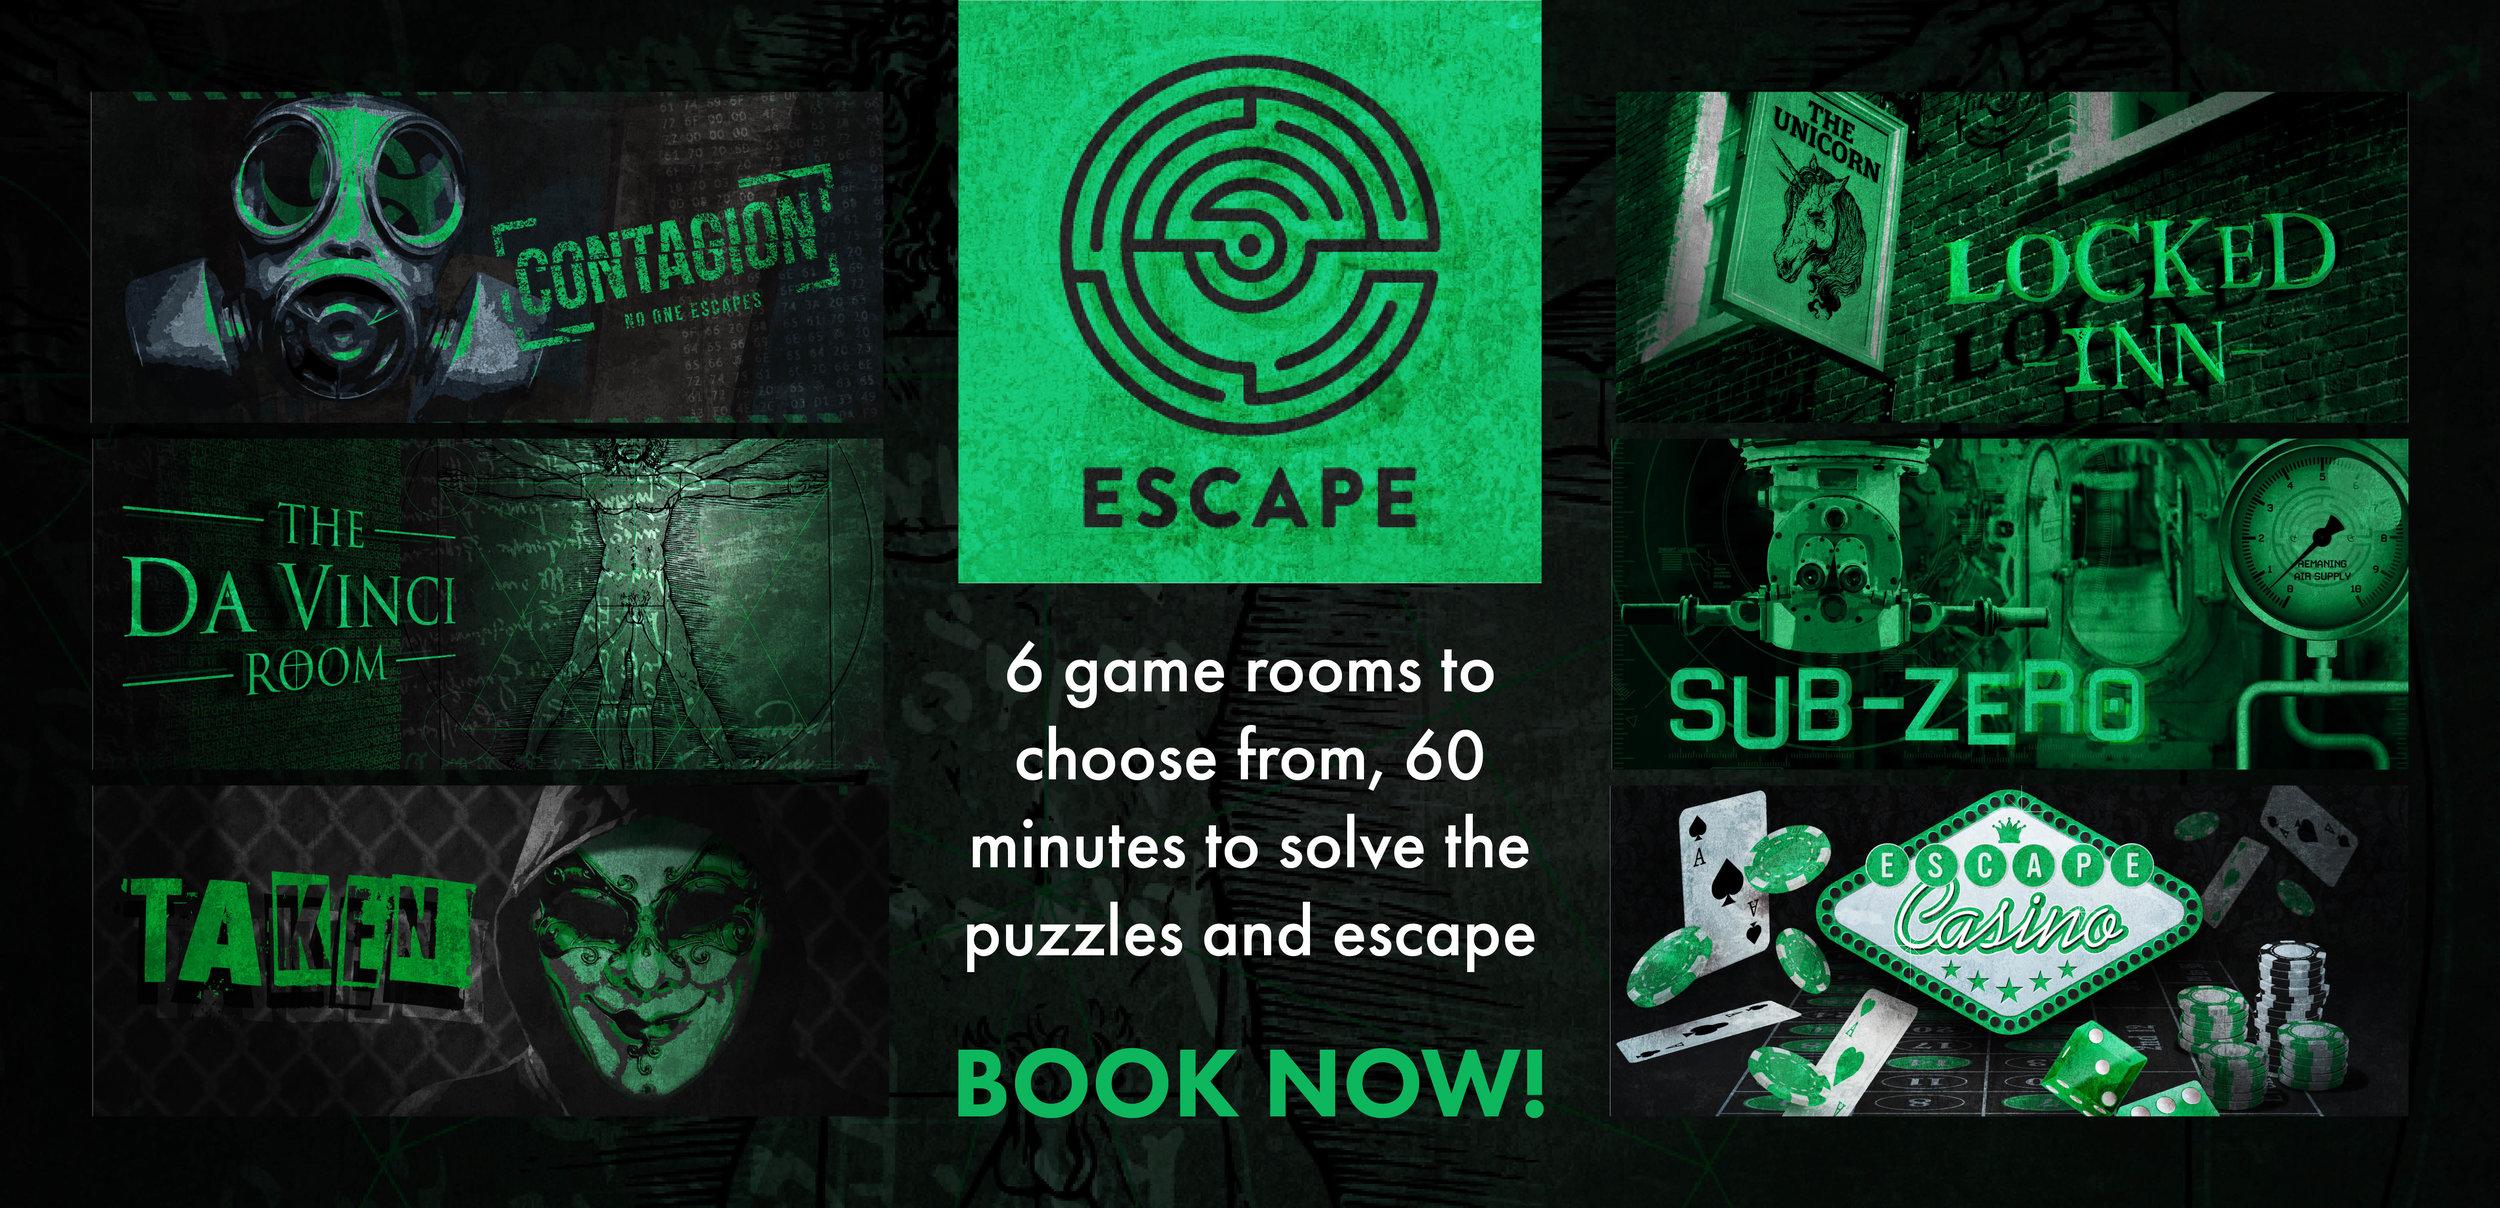 Escape Advert 23.jpg